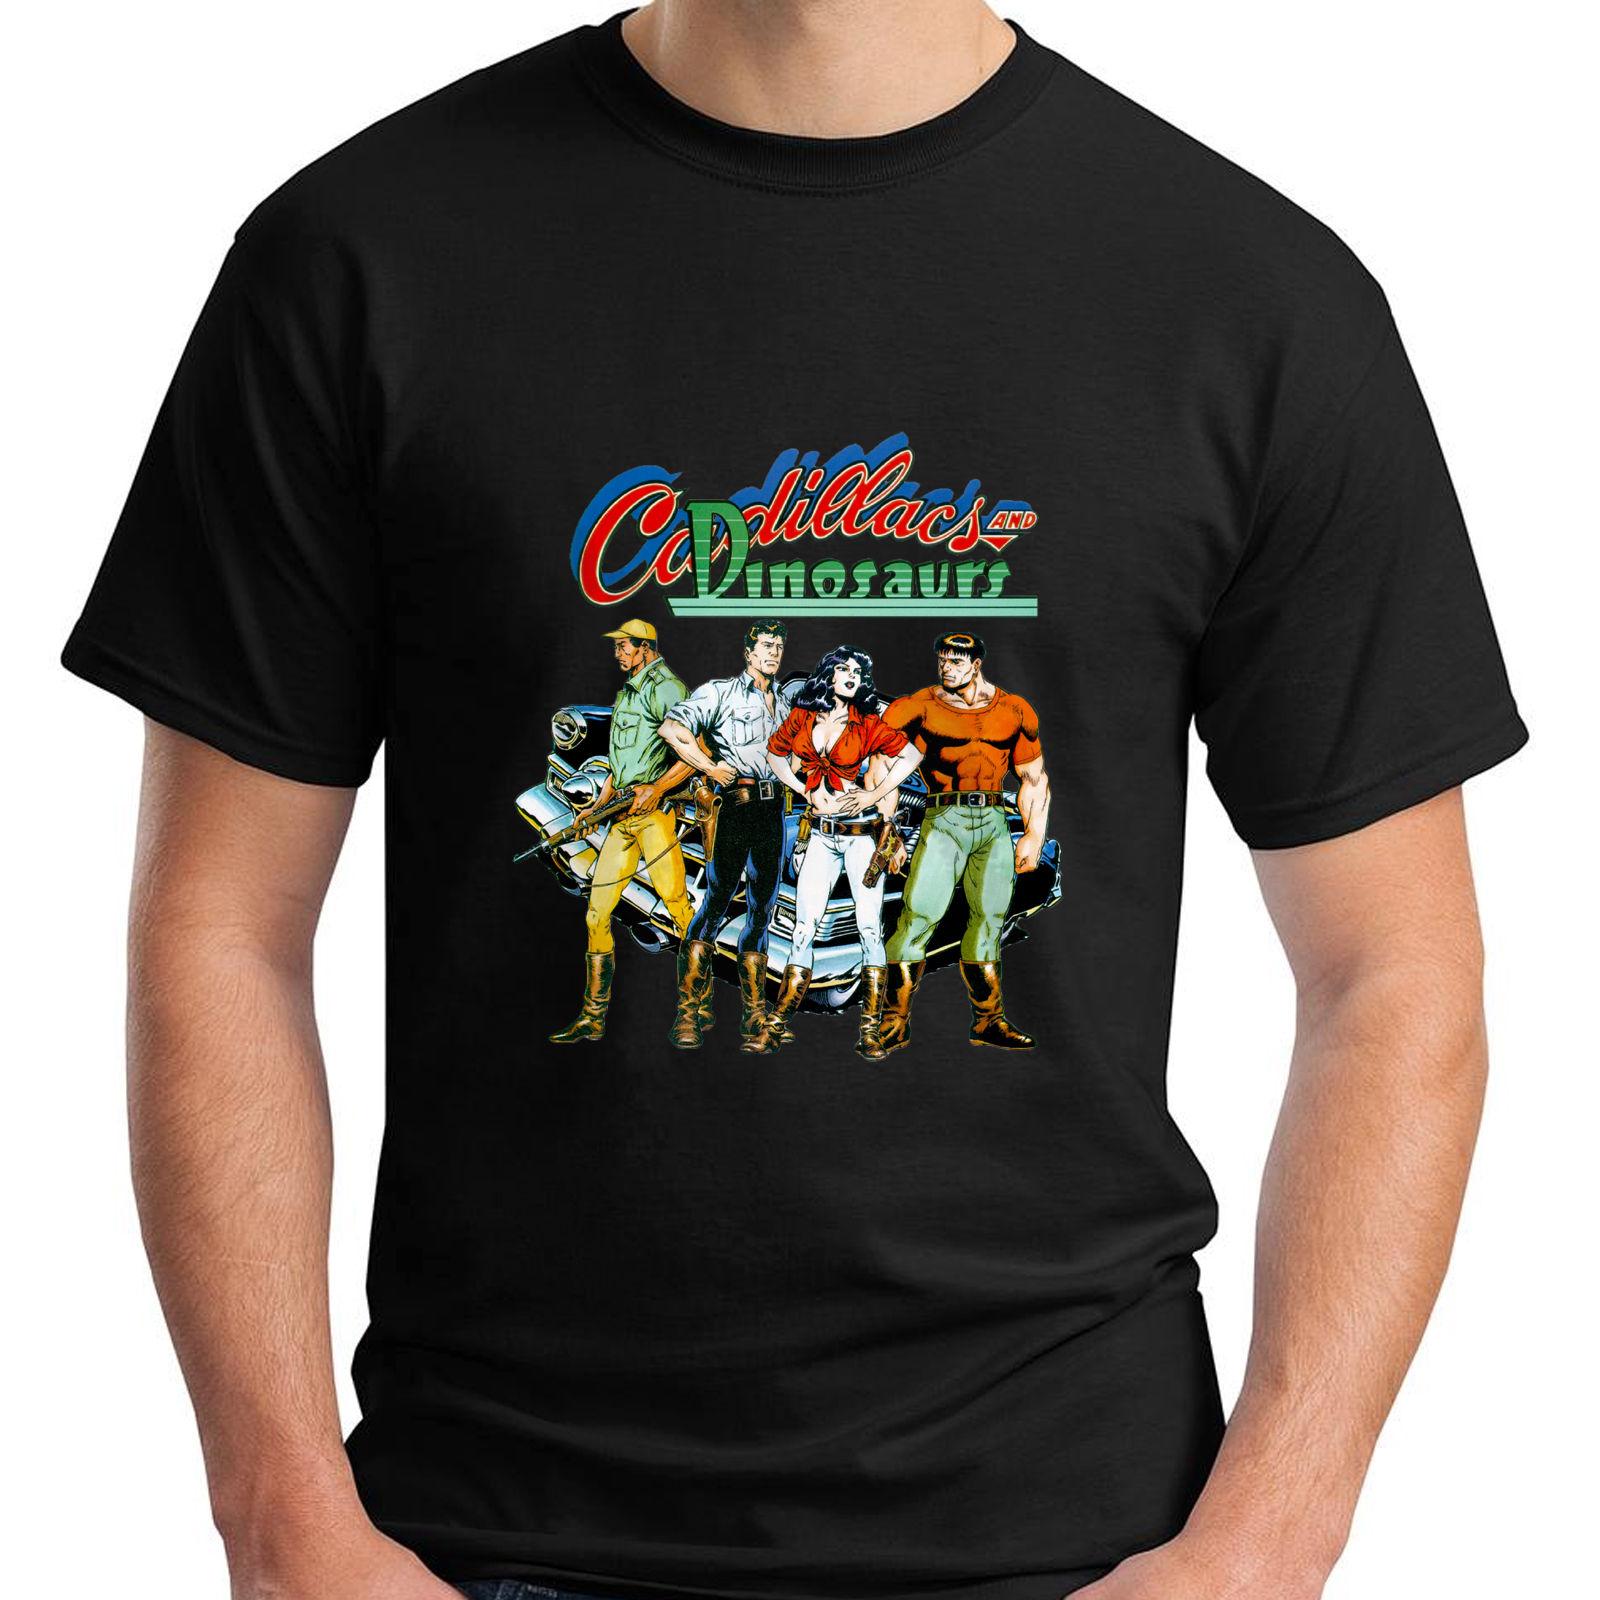 Cadillac и динозавр Ретро видео игры короткий рукав Для мужчин футболка S-3XL